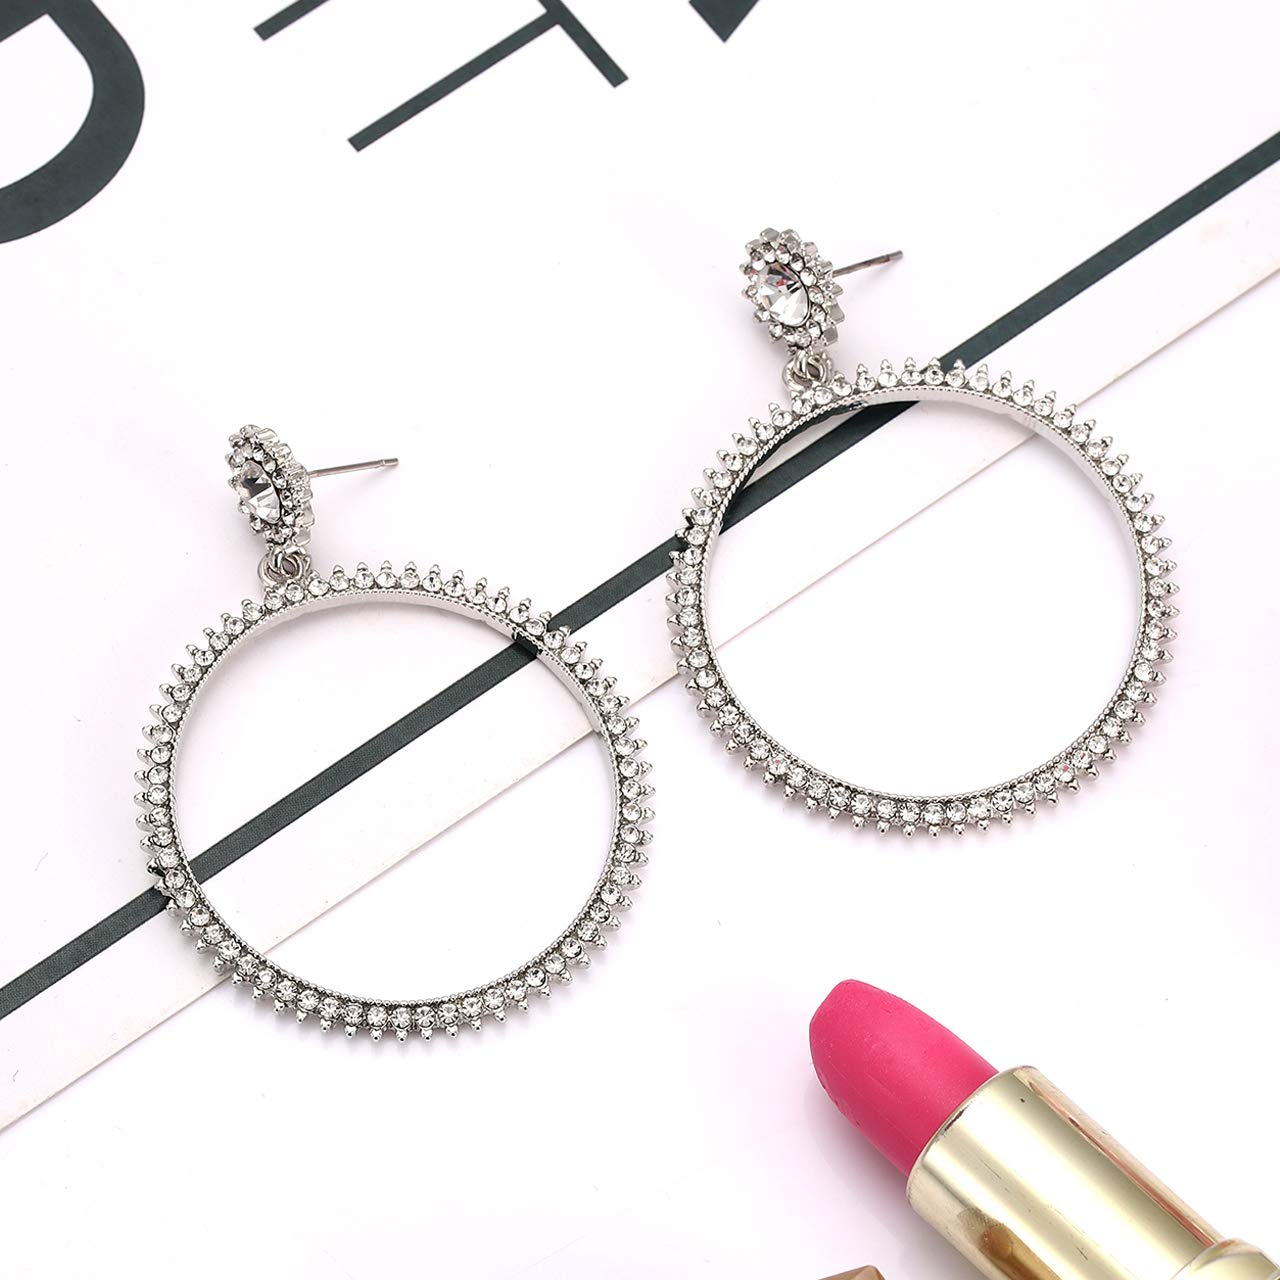 XOCARTIGE Crystal Hoop Earrings Colorful Rhinestone Drop Dangle Earrings Studs for Women Girls